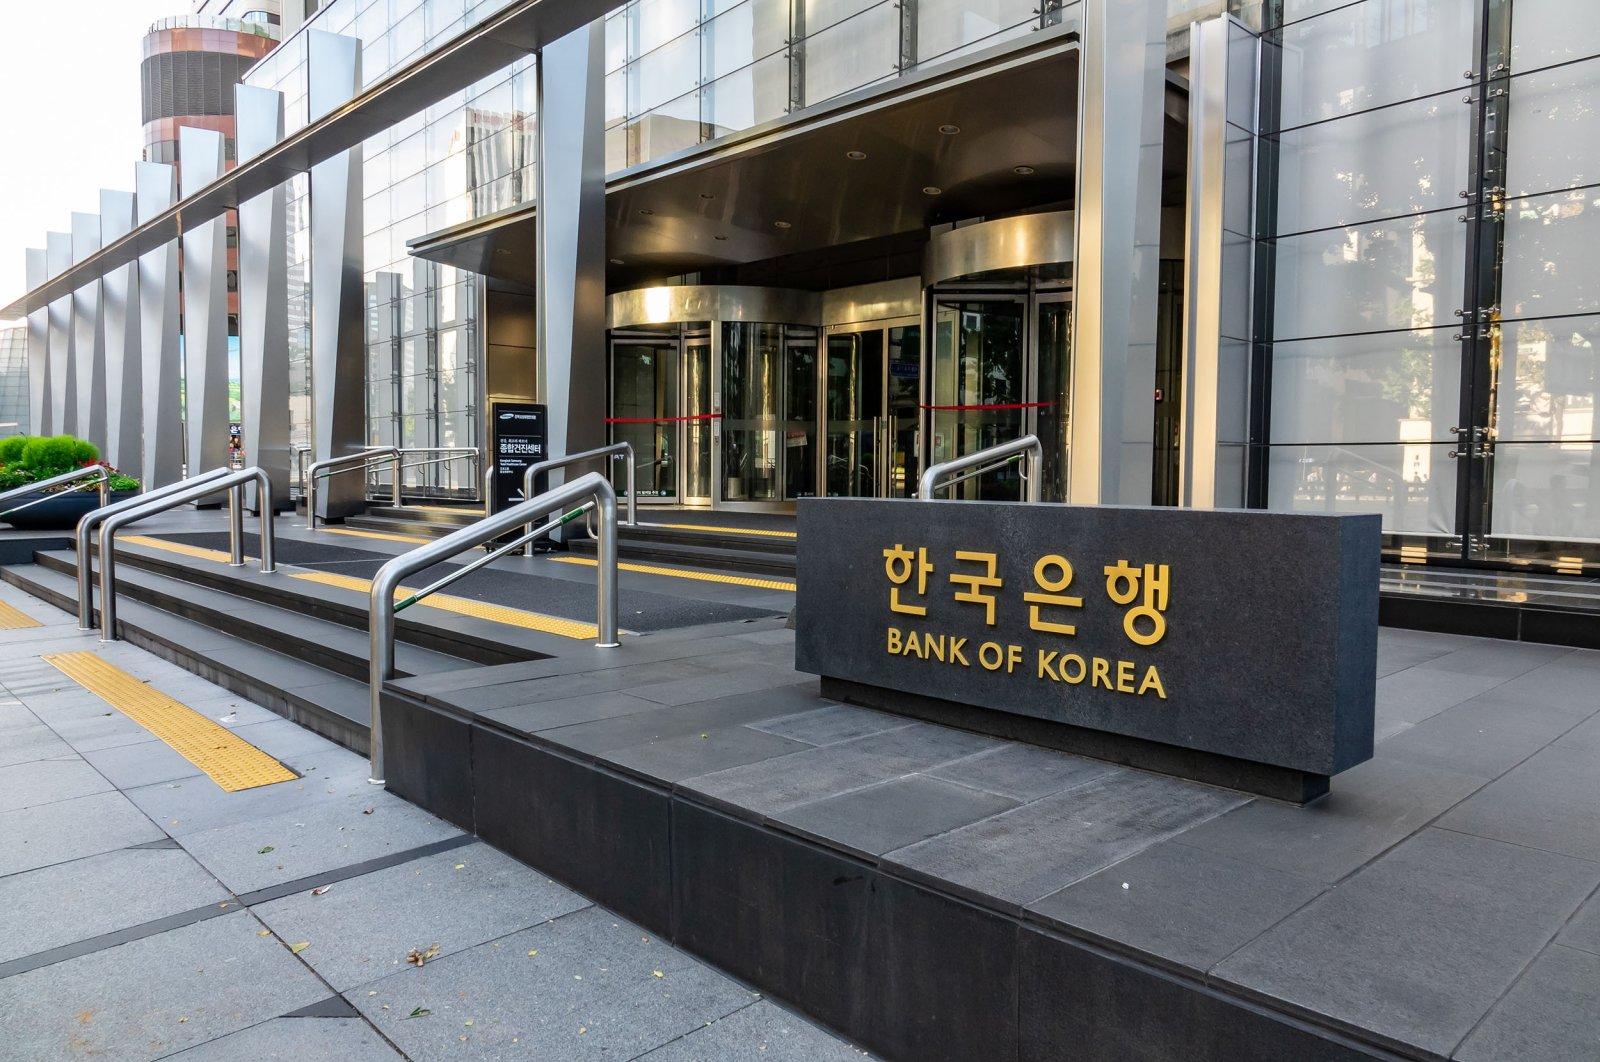 The building of the Bank of Korea, Seoul, South Korea, Aug 31, 2019. (Shutterstock Photo)